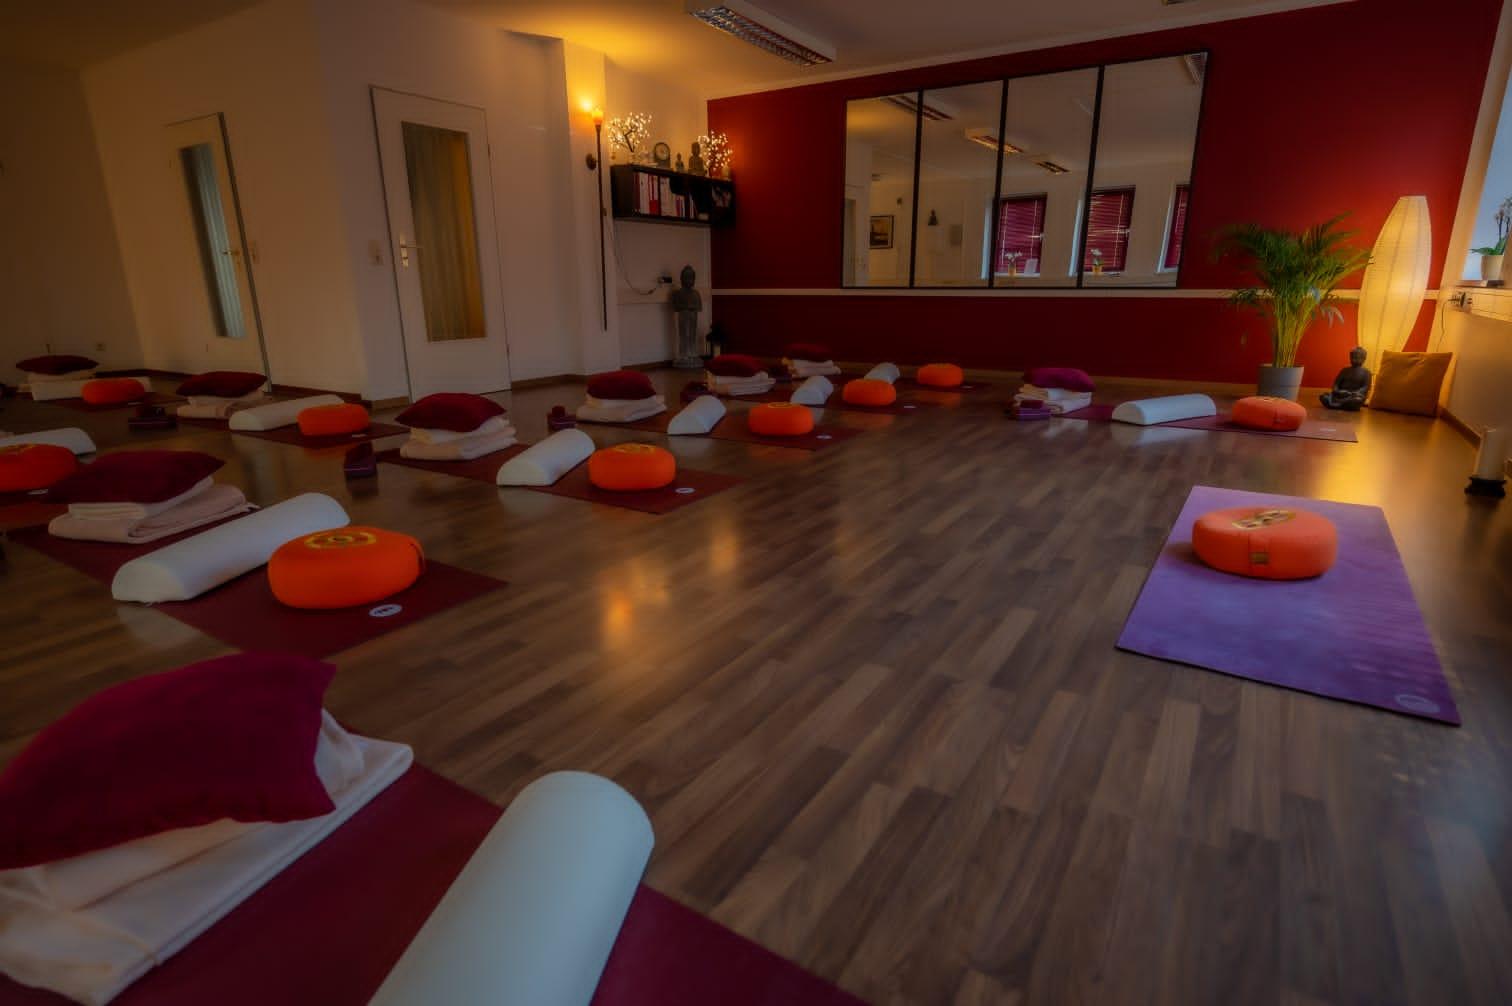 Katis Yoga Vaira Centrum Katis Yoga Centrum